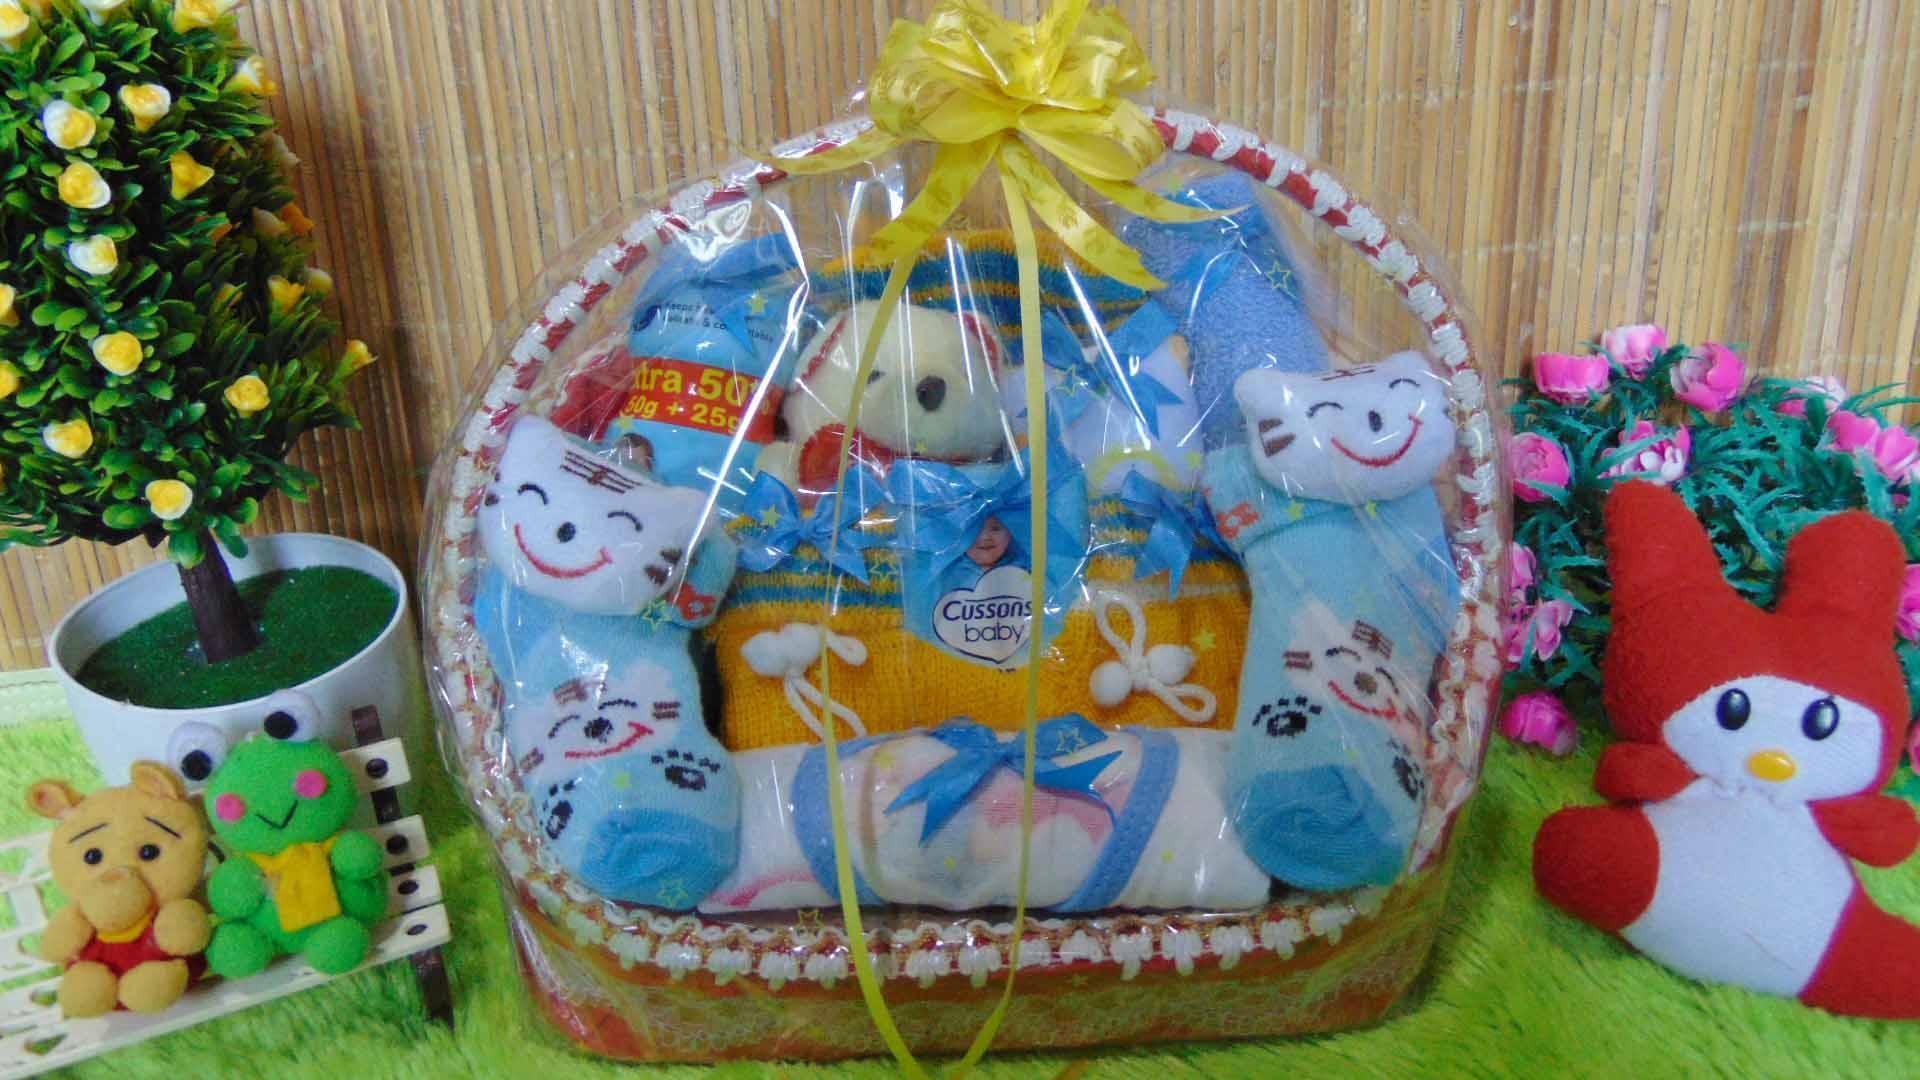 Daftar Harga Parcel Bayi Termurah 2018 Cekharga Pigeon Standard 1 Baby Gift Set Pa051001 Kembarshop Terlaris Paket Kado Lahiran